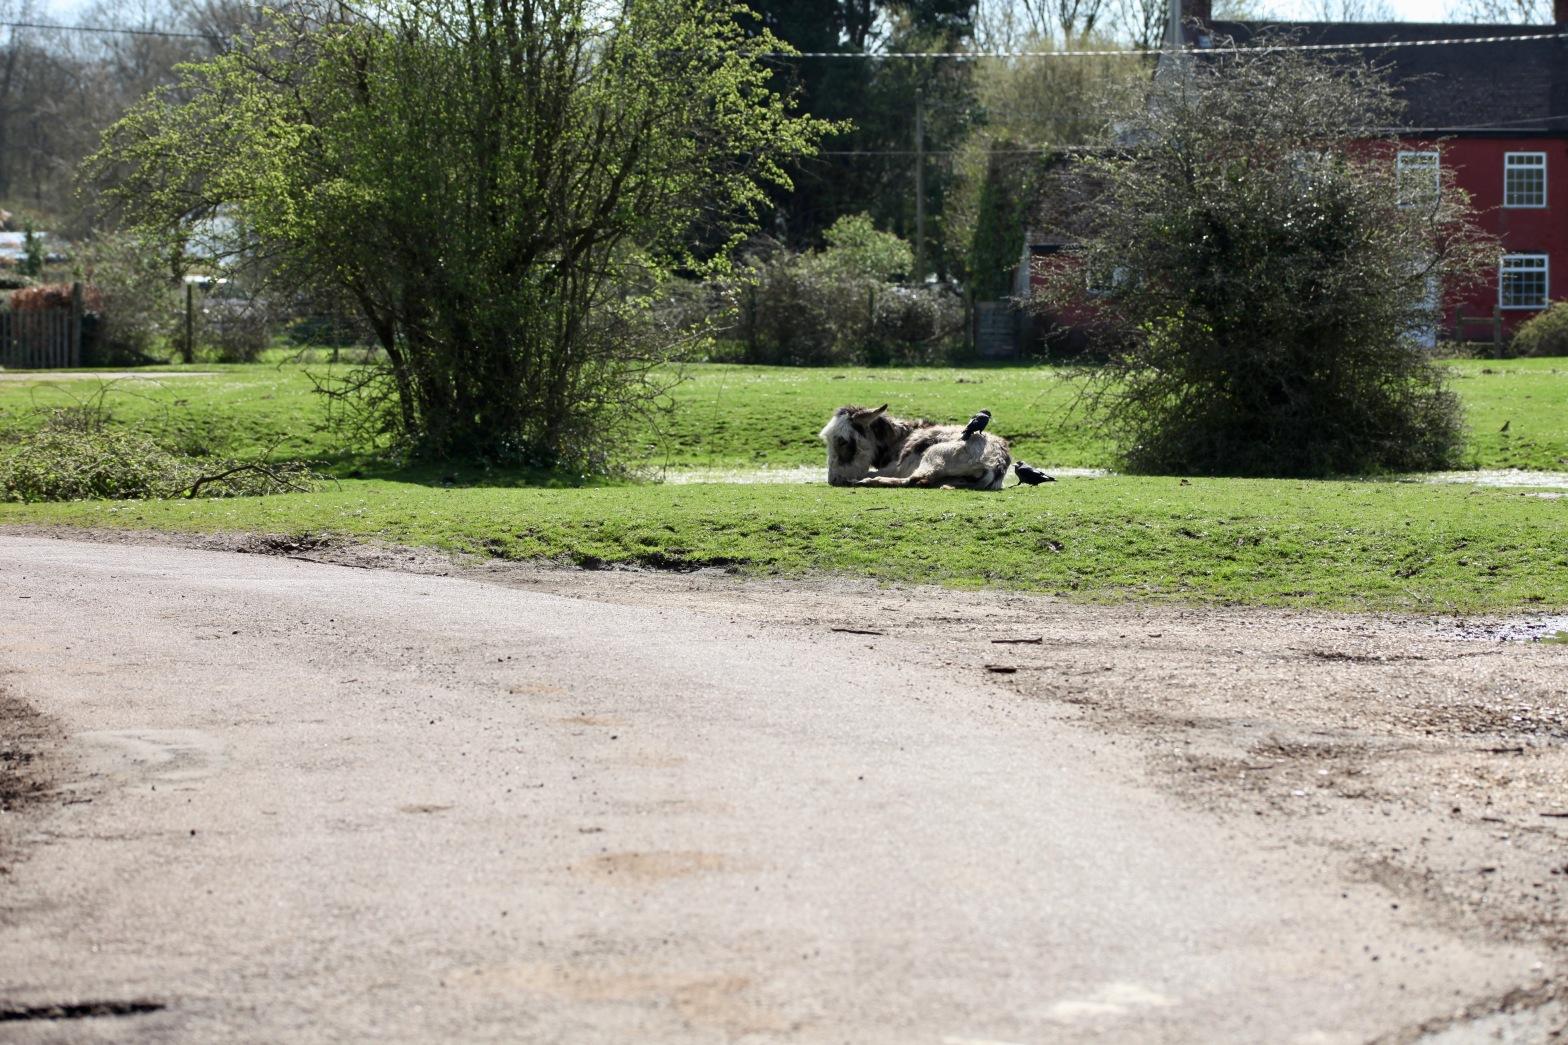 Jackdaws and donkey